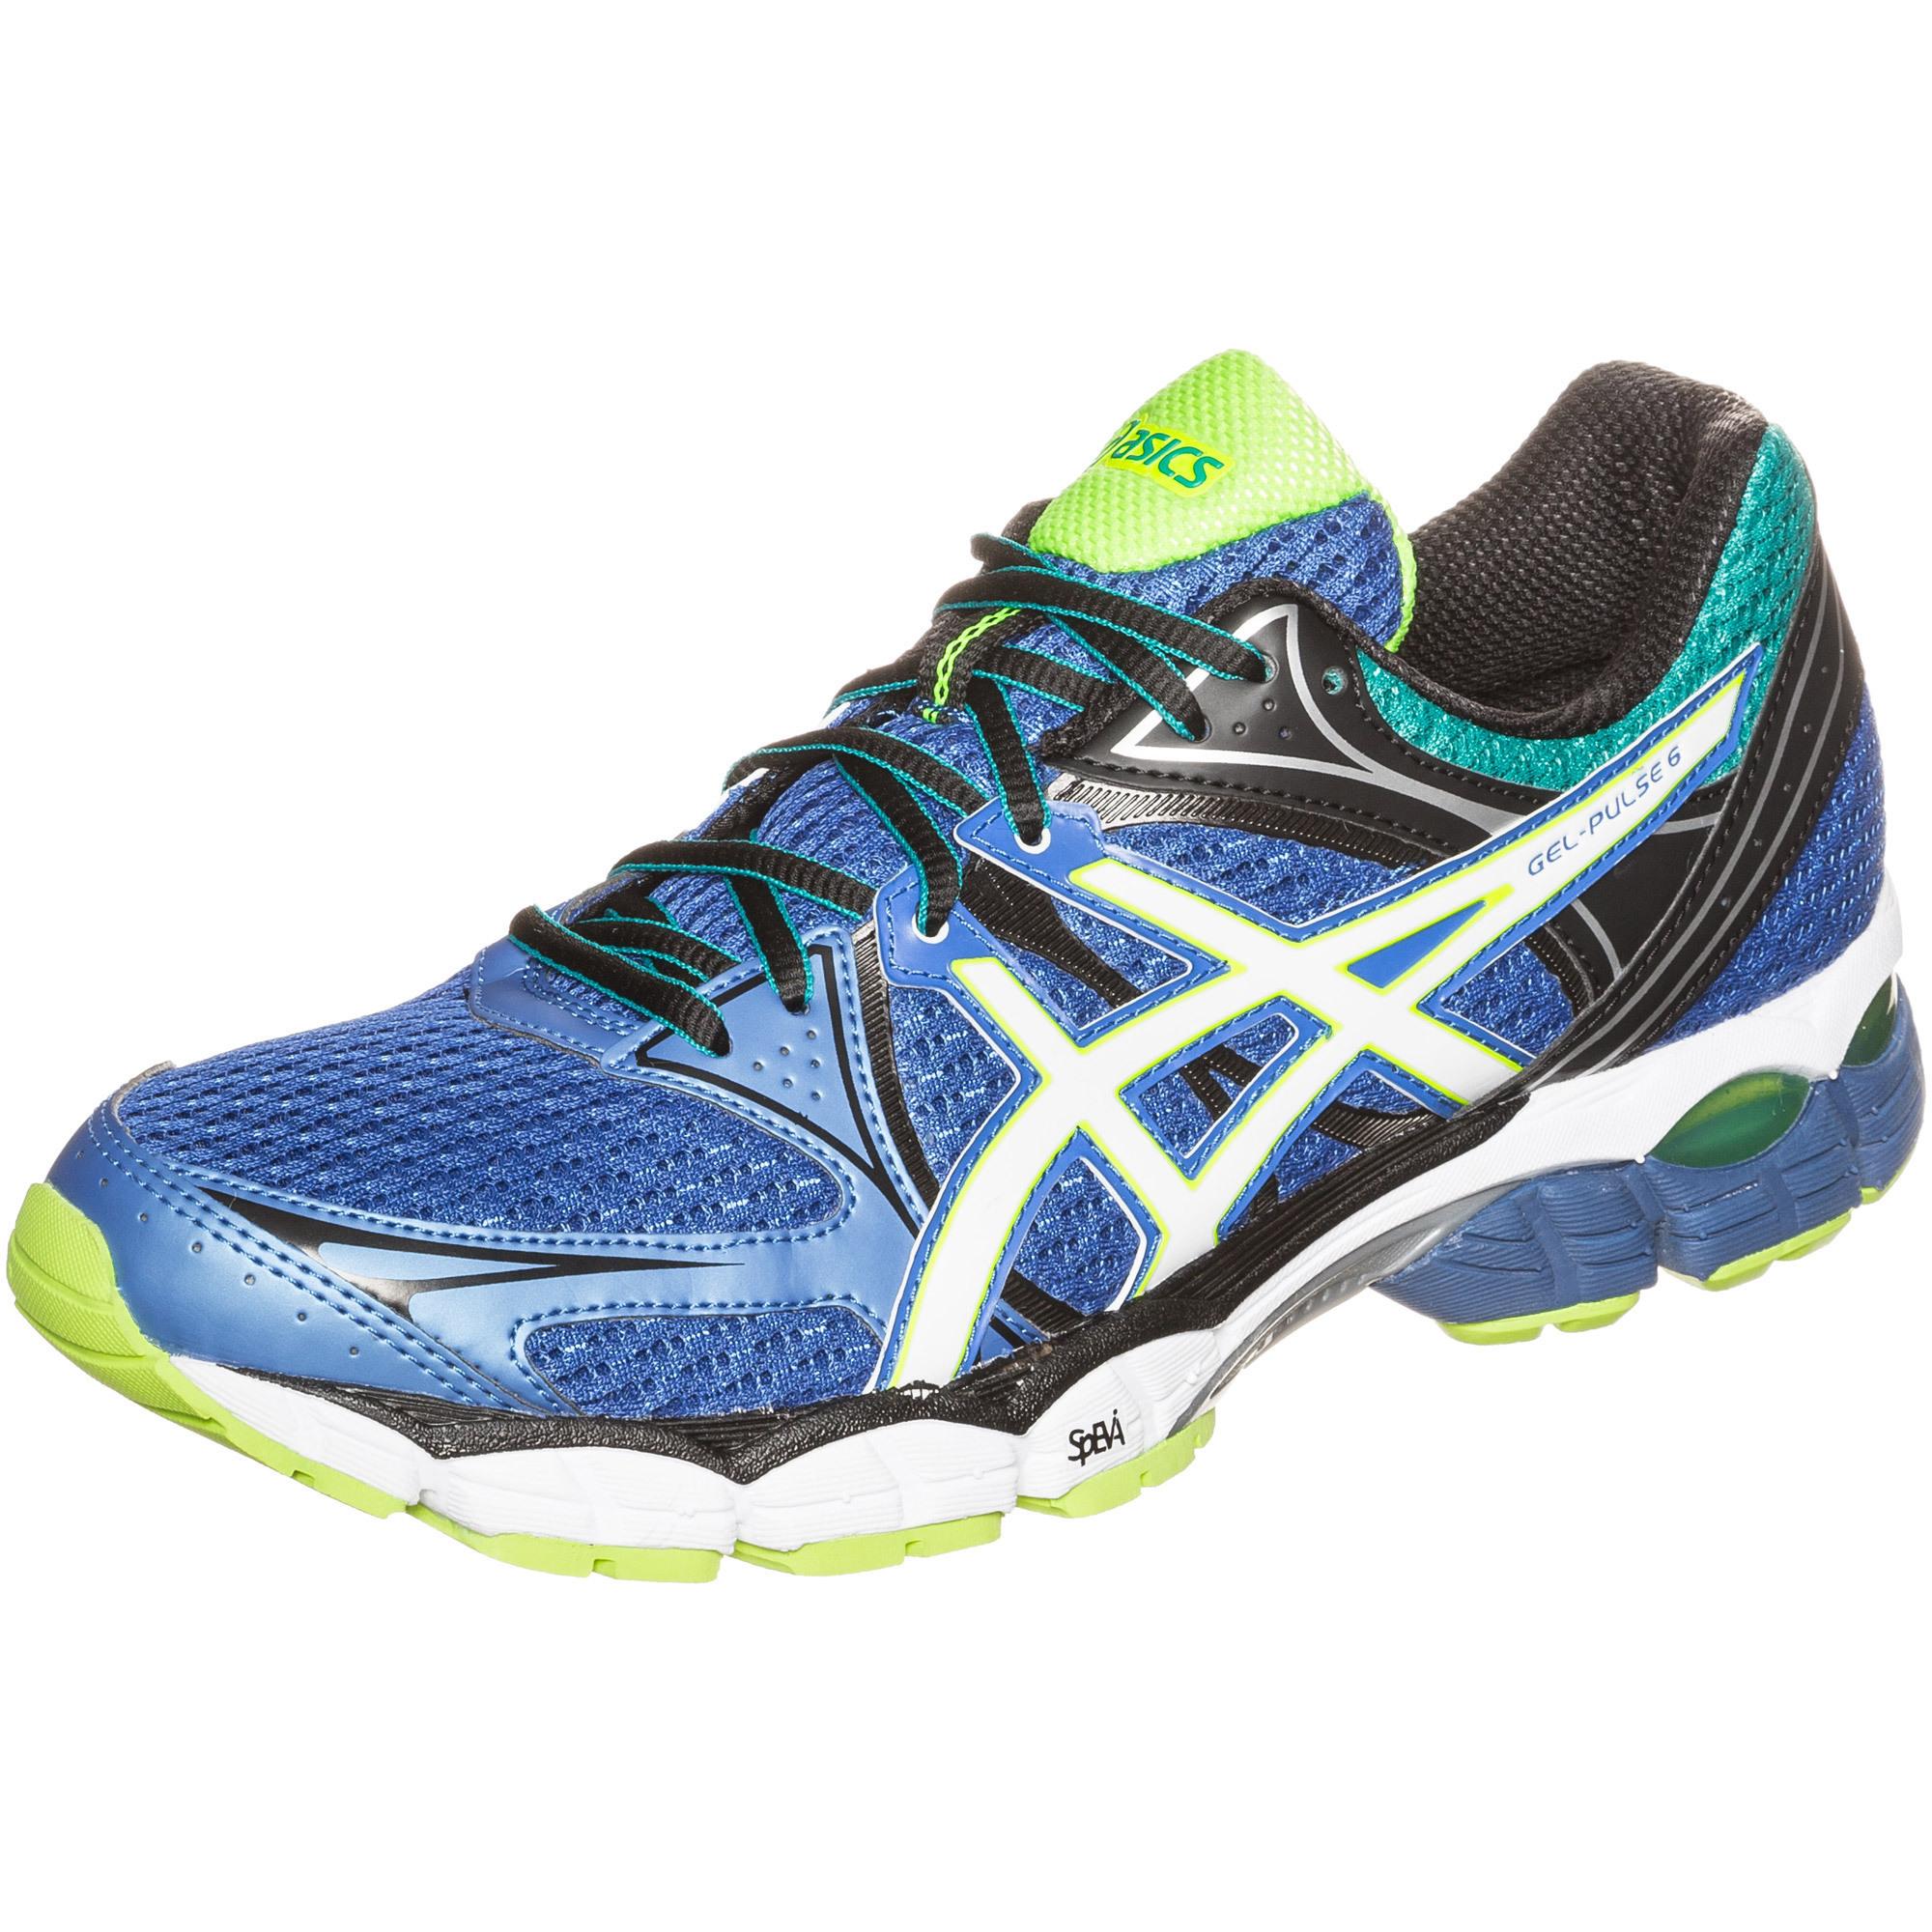 Asics Gel-Pulse 6 Кроссовки для бега мужские T4A3N 4200